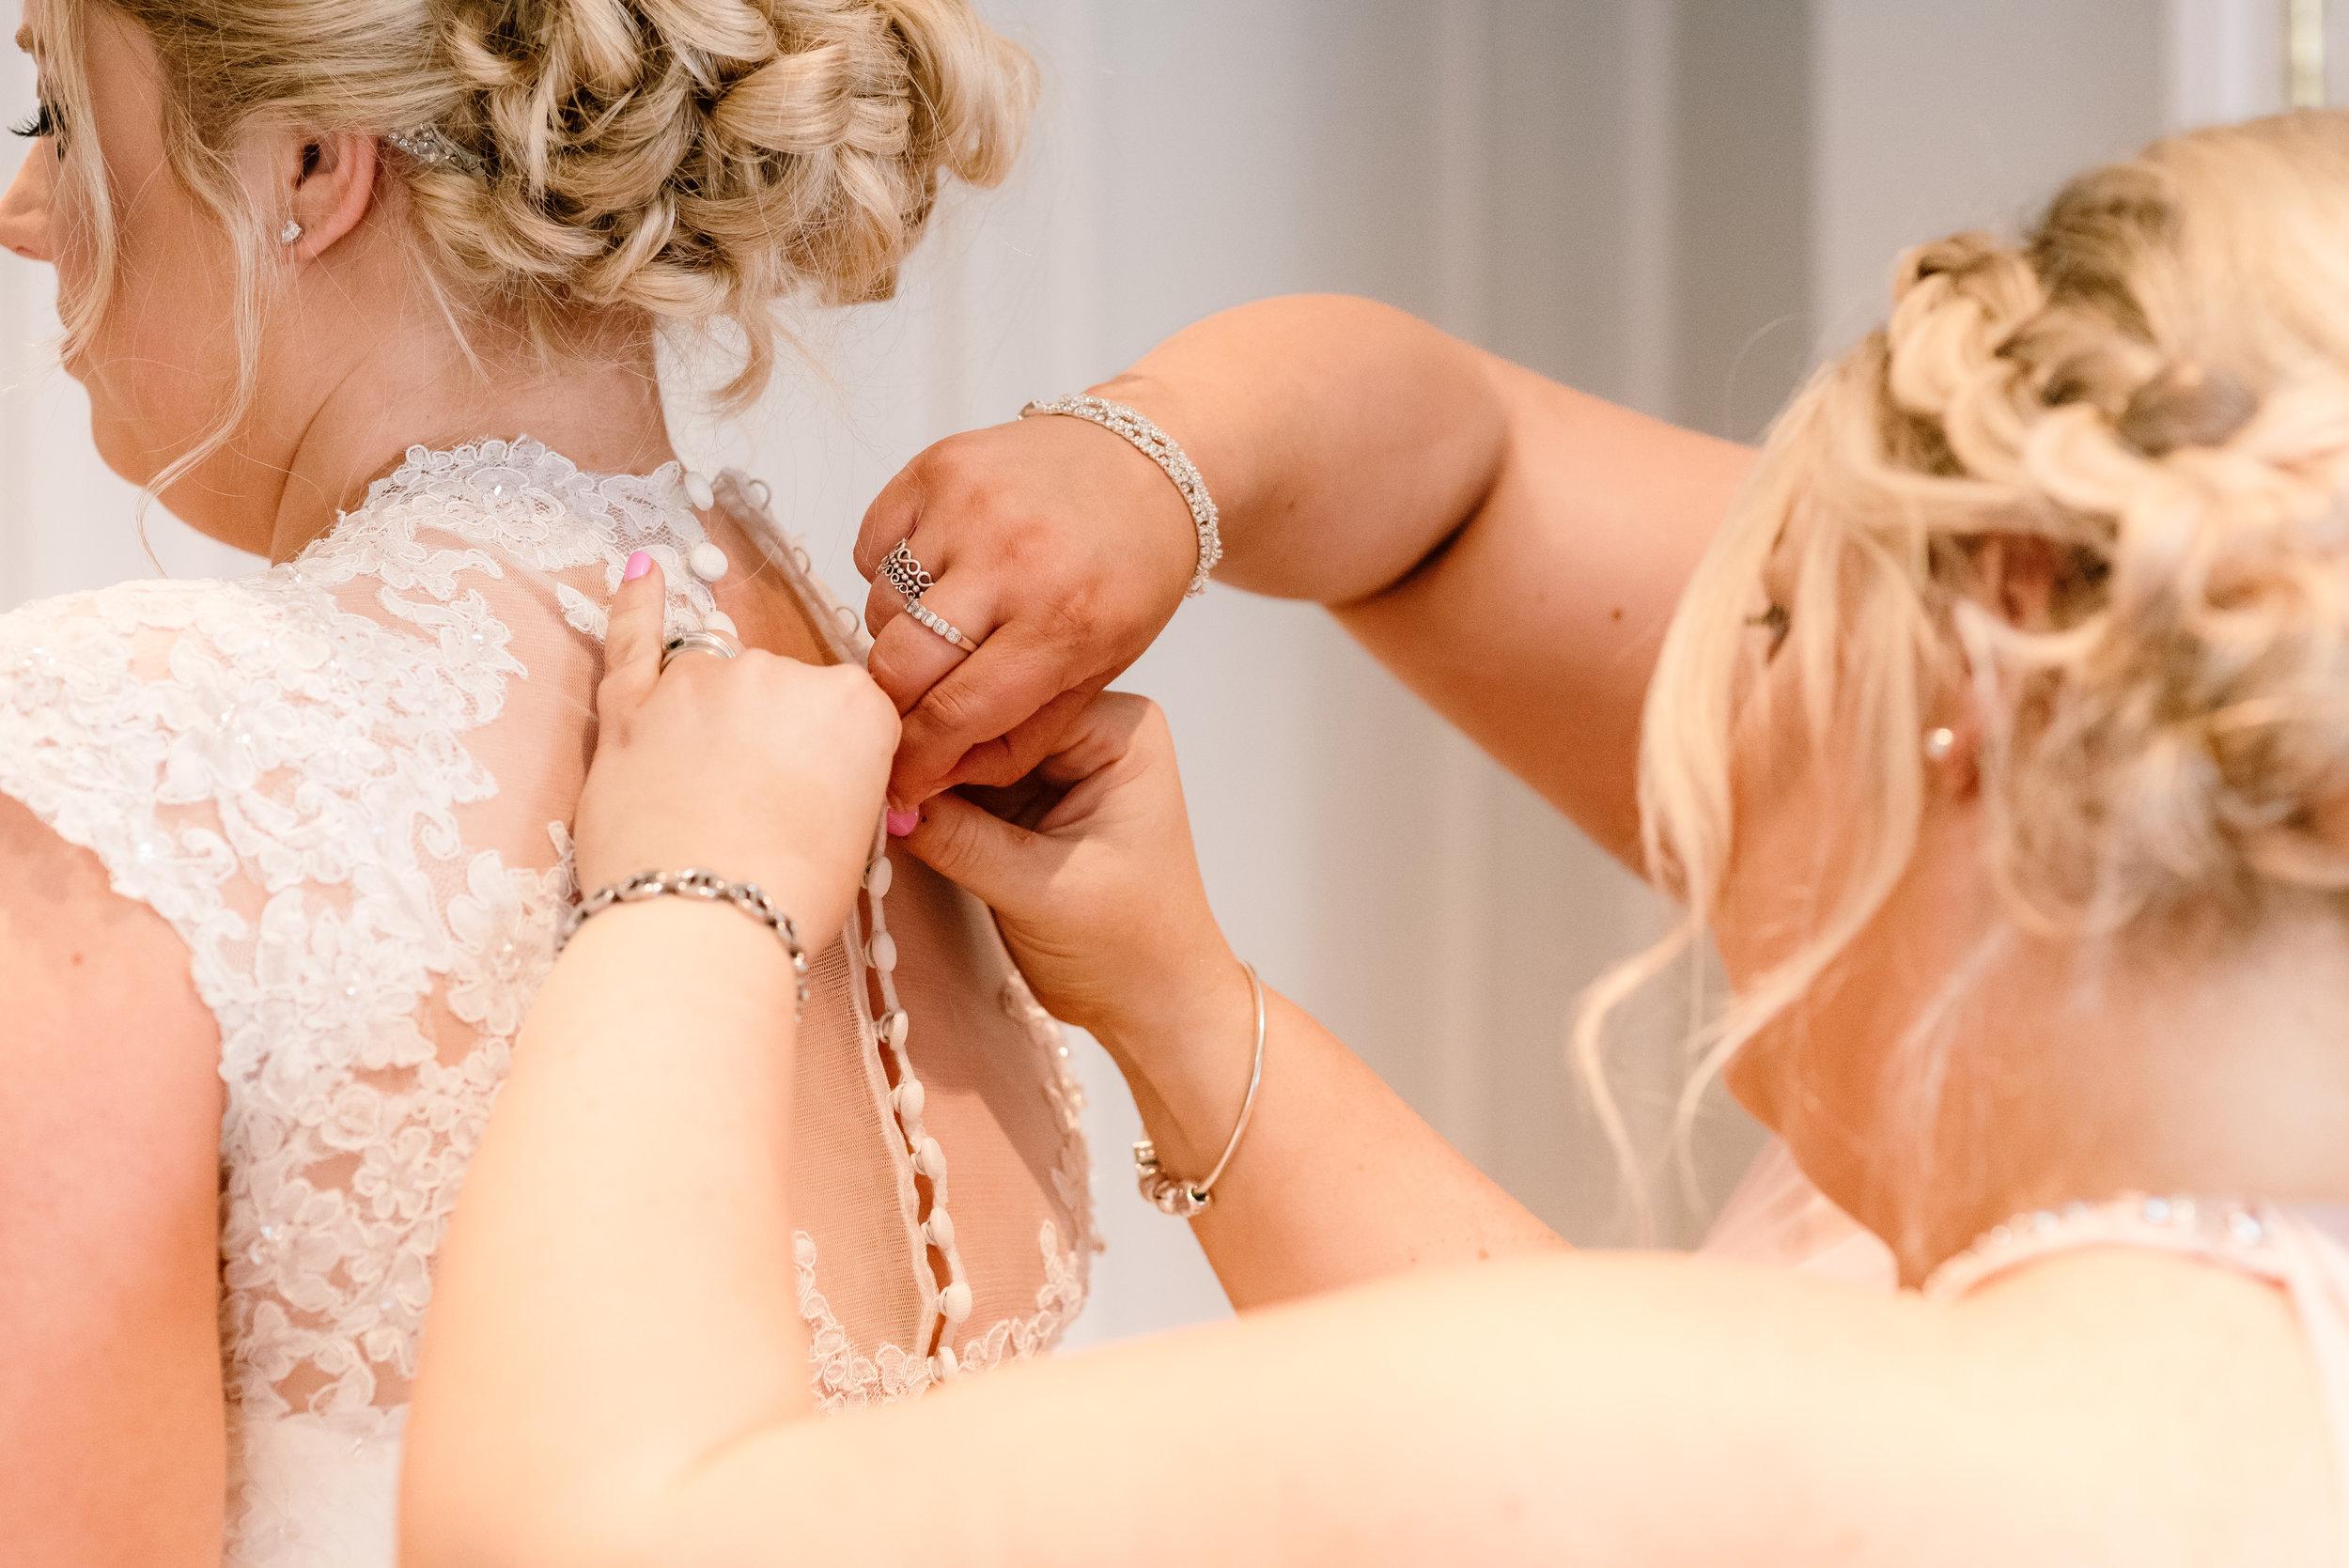 Sarah-fishlock-photography / hampshire-wedding-photographer-hampshire / fleet-wedding-photographer-fleet / northbrook-park-wedding-photographer / northbrook-park-wedding-venue / farnham-wedding-venue / hampshire-wedding-venue / Surrey-wedding-venue / Surrey-wedding-photographer / natural-wedding-photographer / natural-wedding-photos /